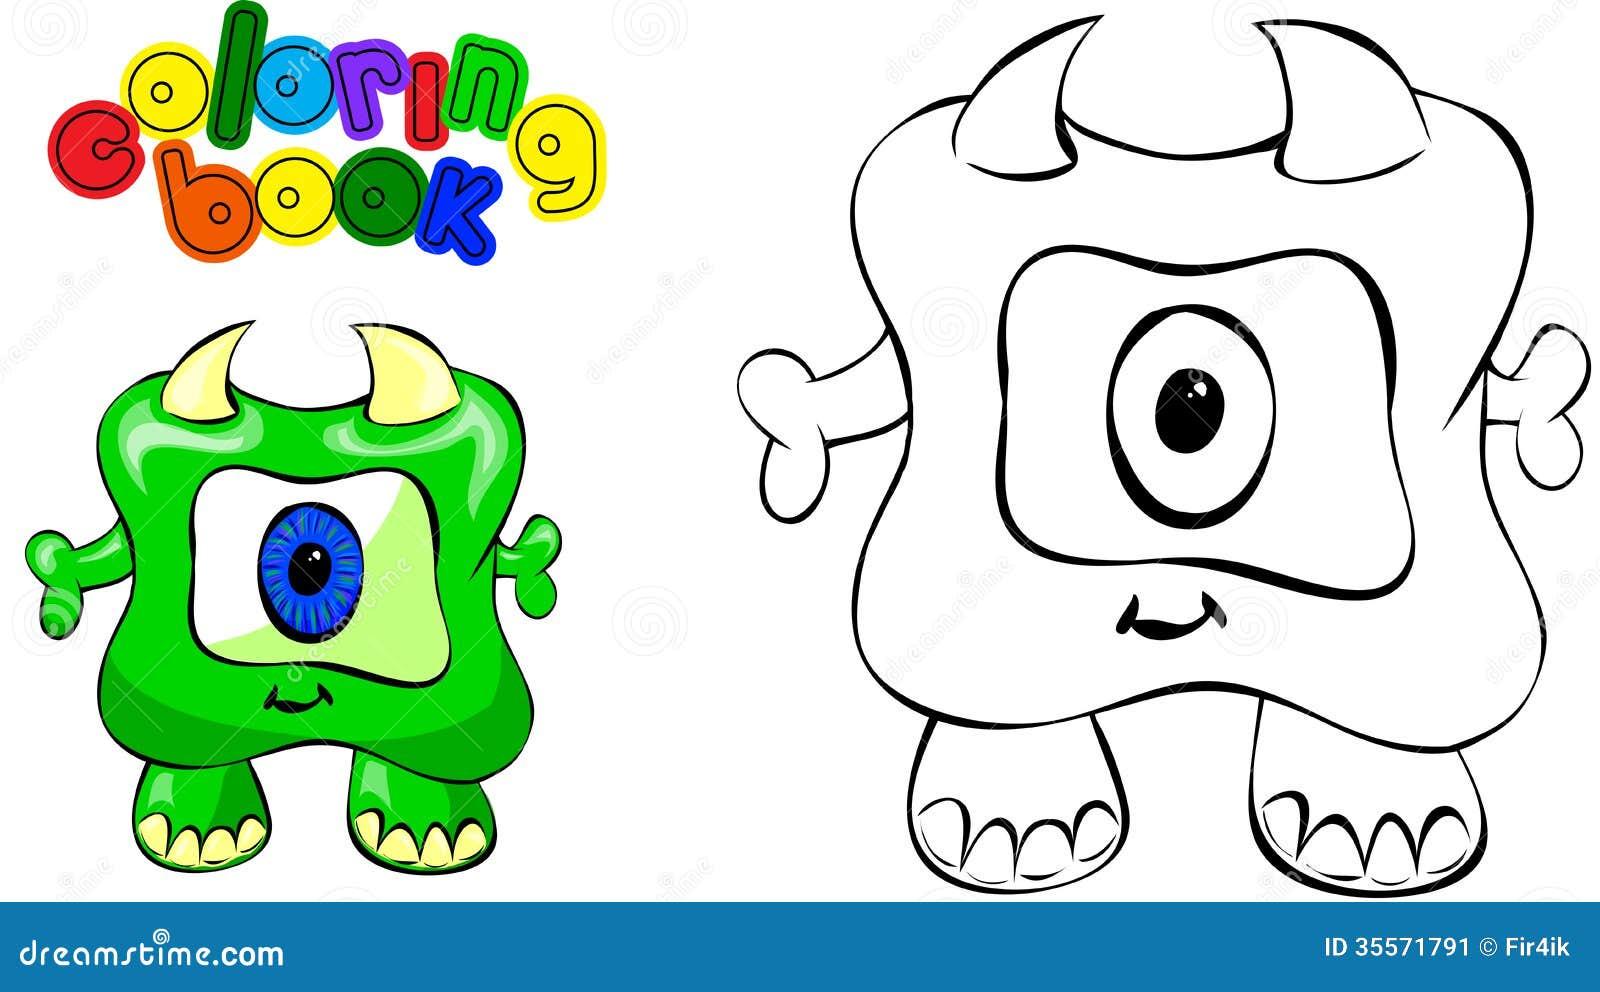 Contemporáneo Lindo Monstruo Alto Para Colorear Ornamento - Dibujos ...